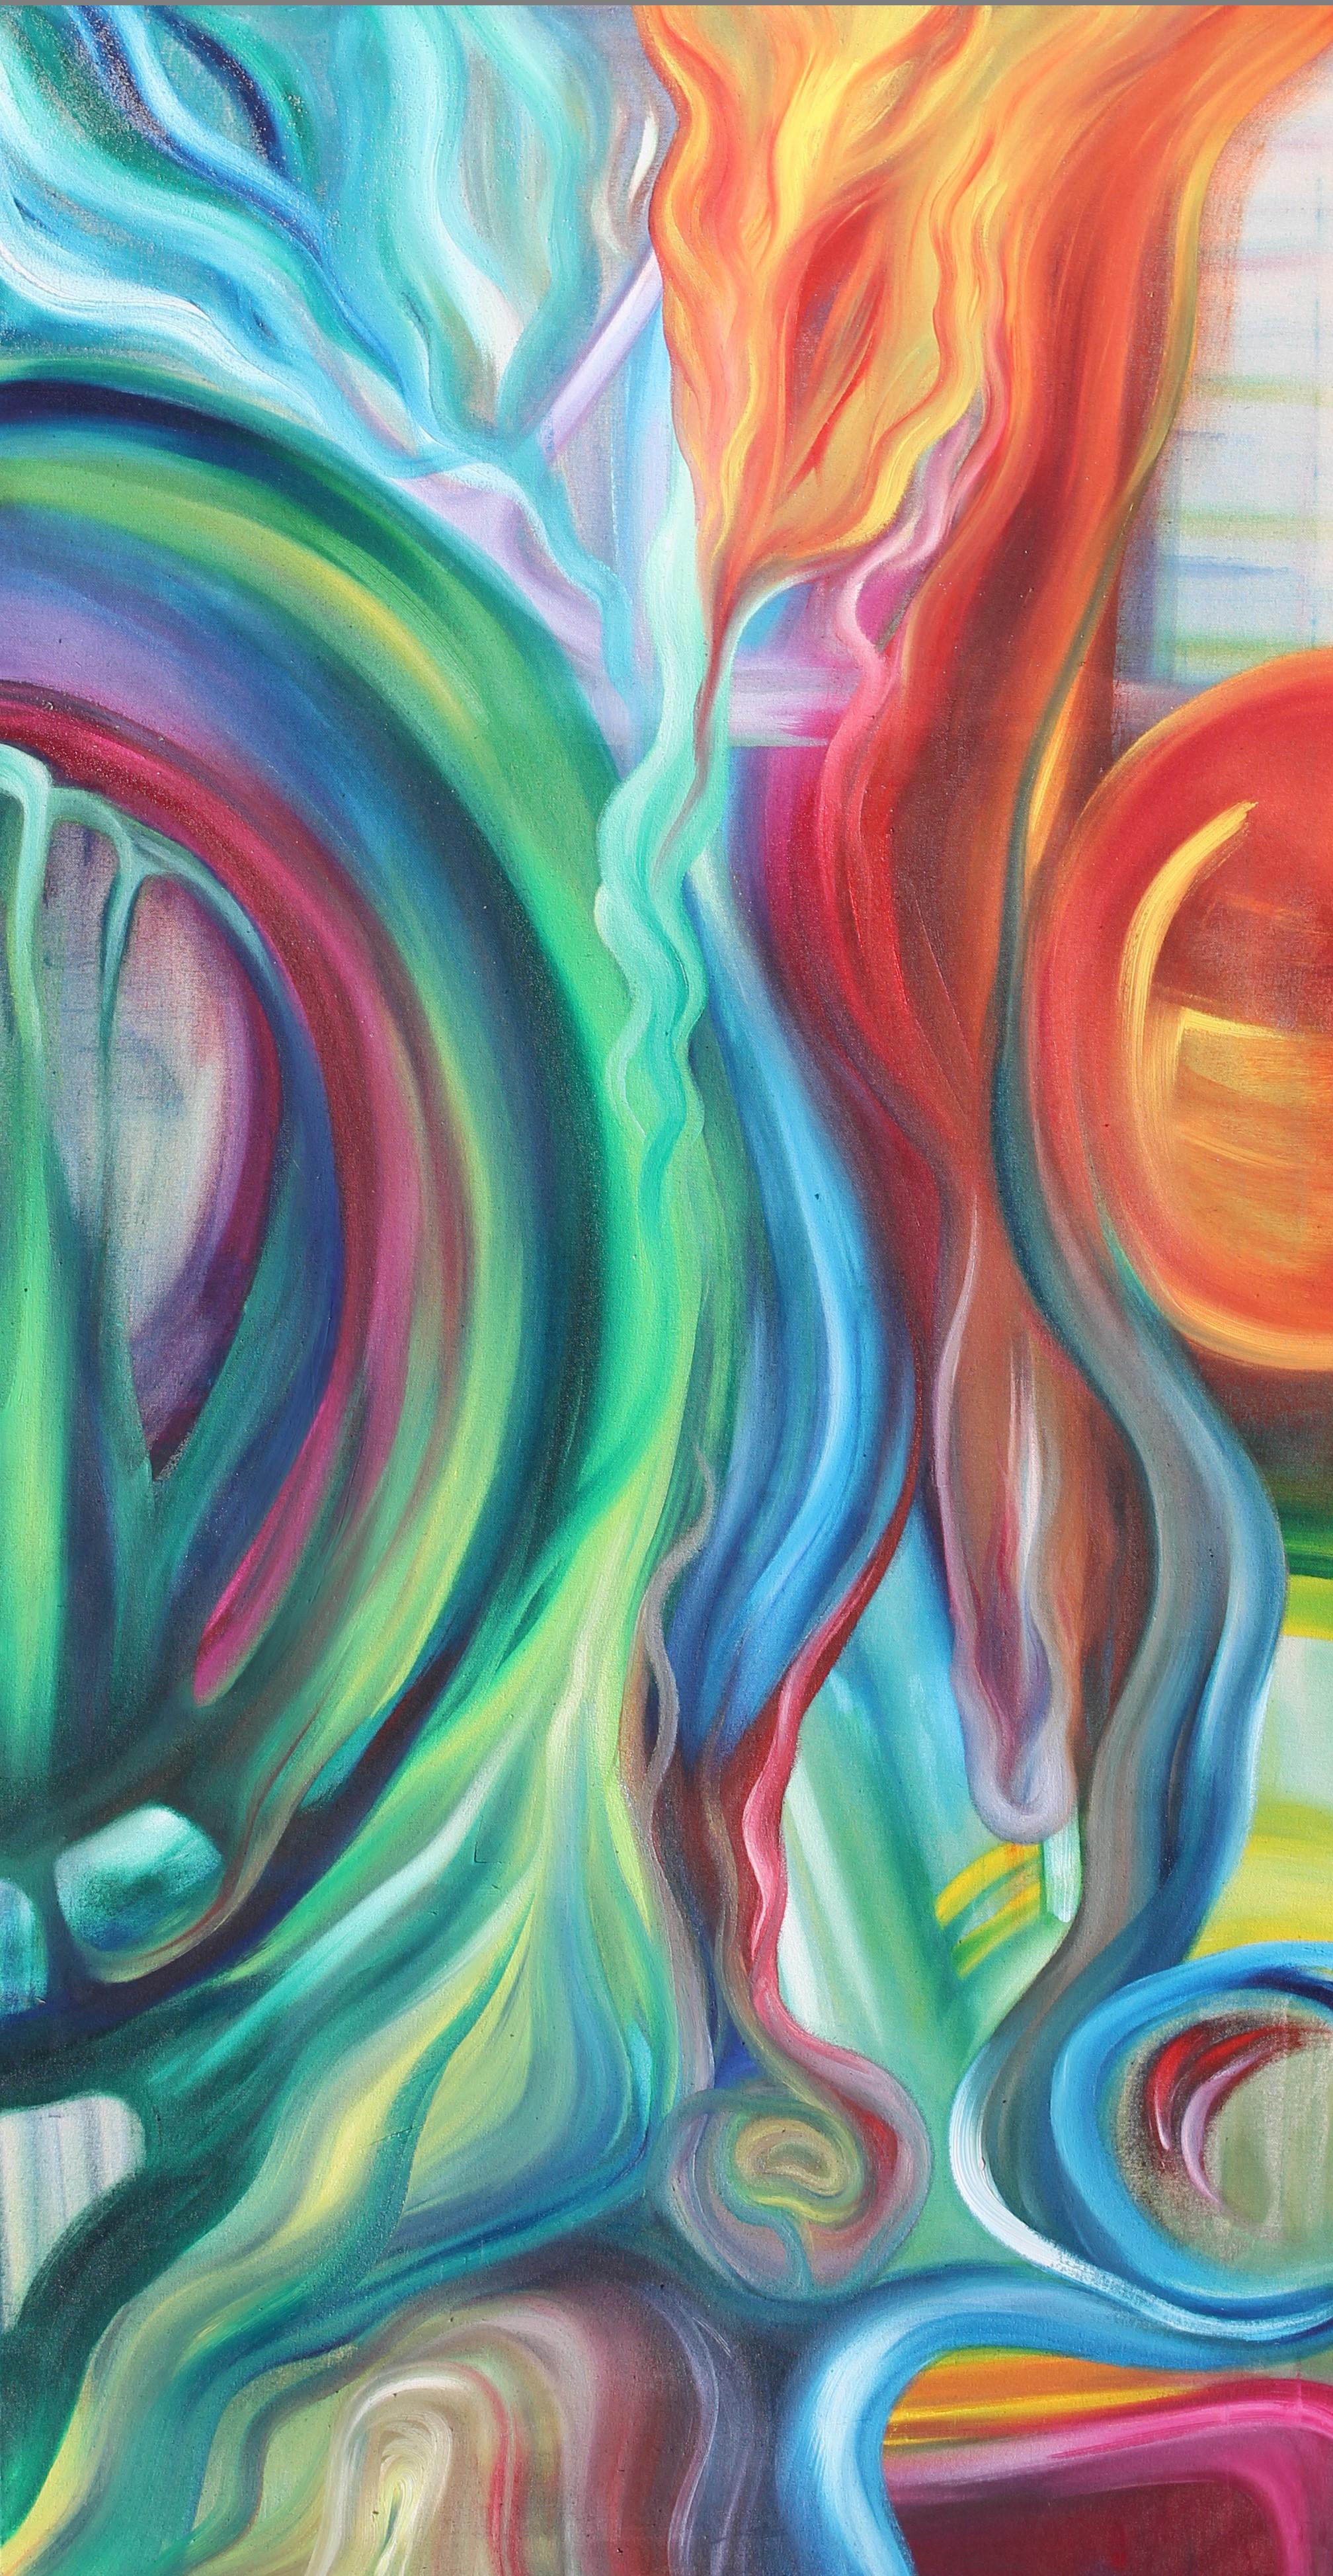 01. Virdi_Amrita Transience (2016) Oil on Canvas, 24x60 inches.JPG